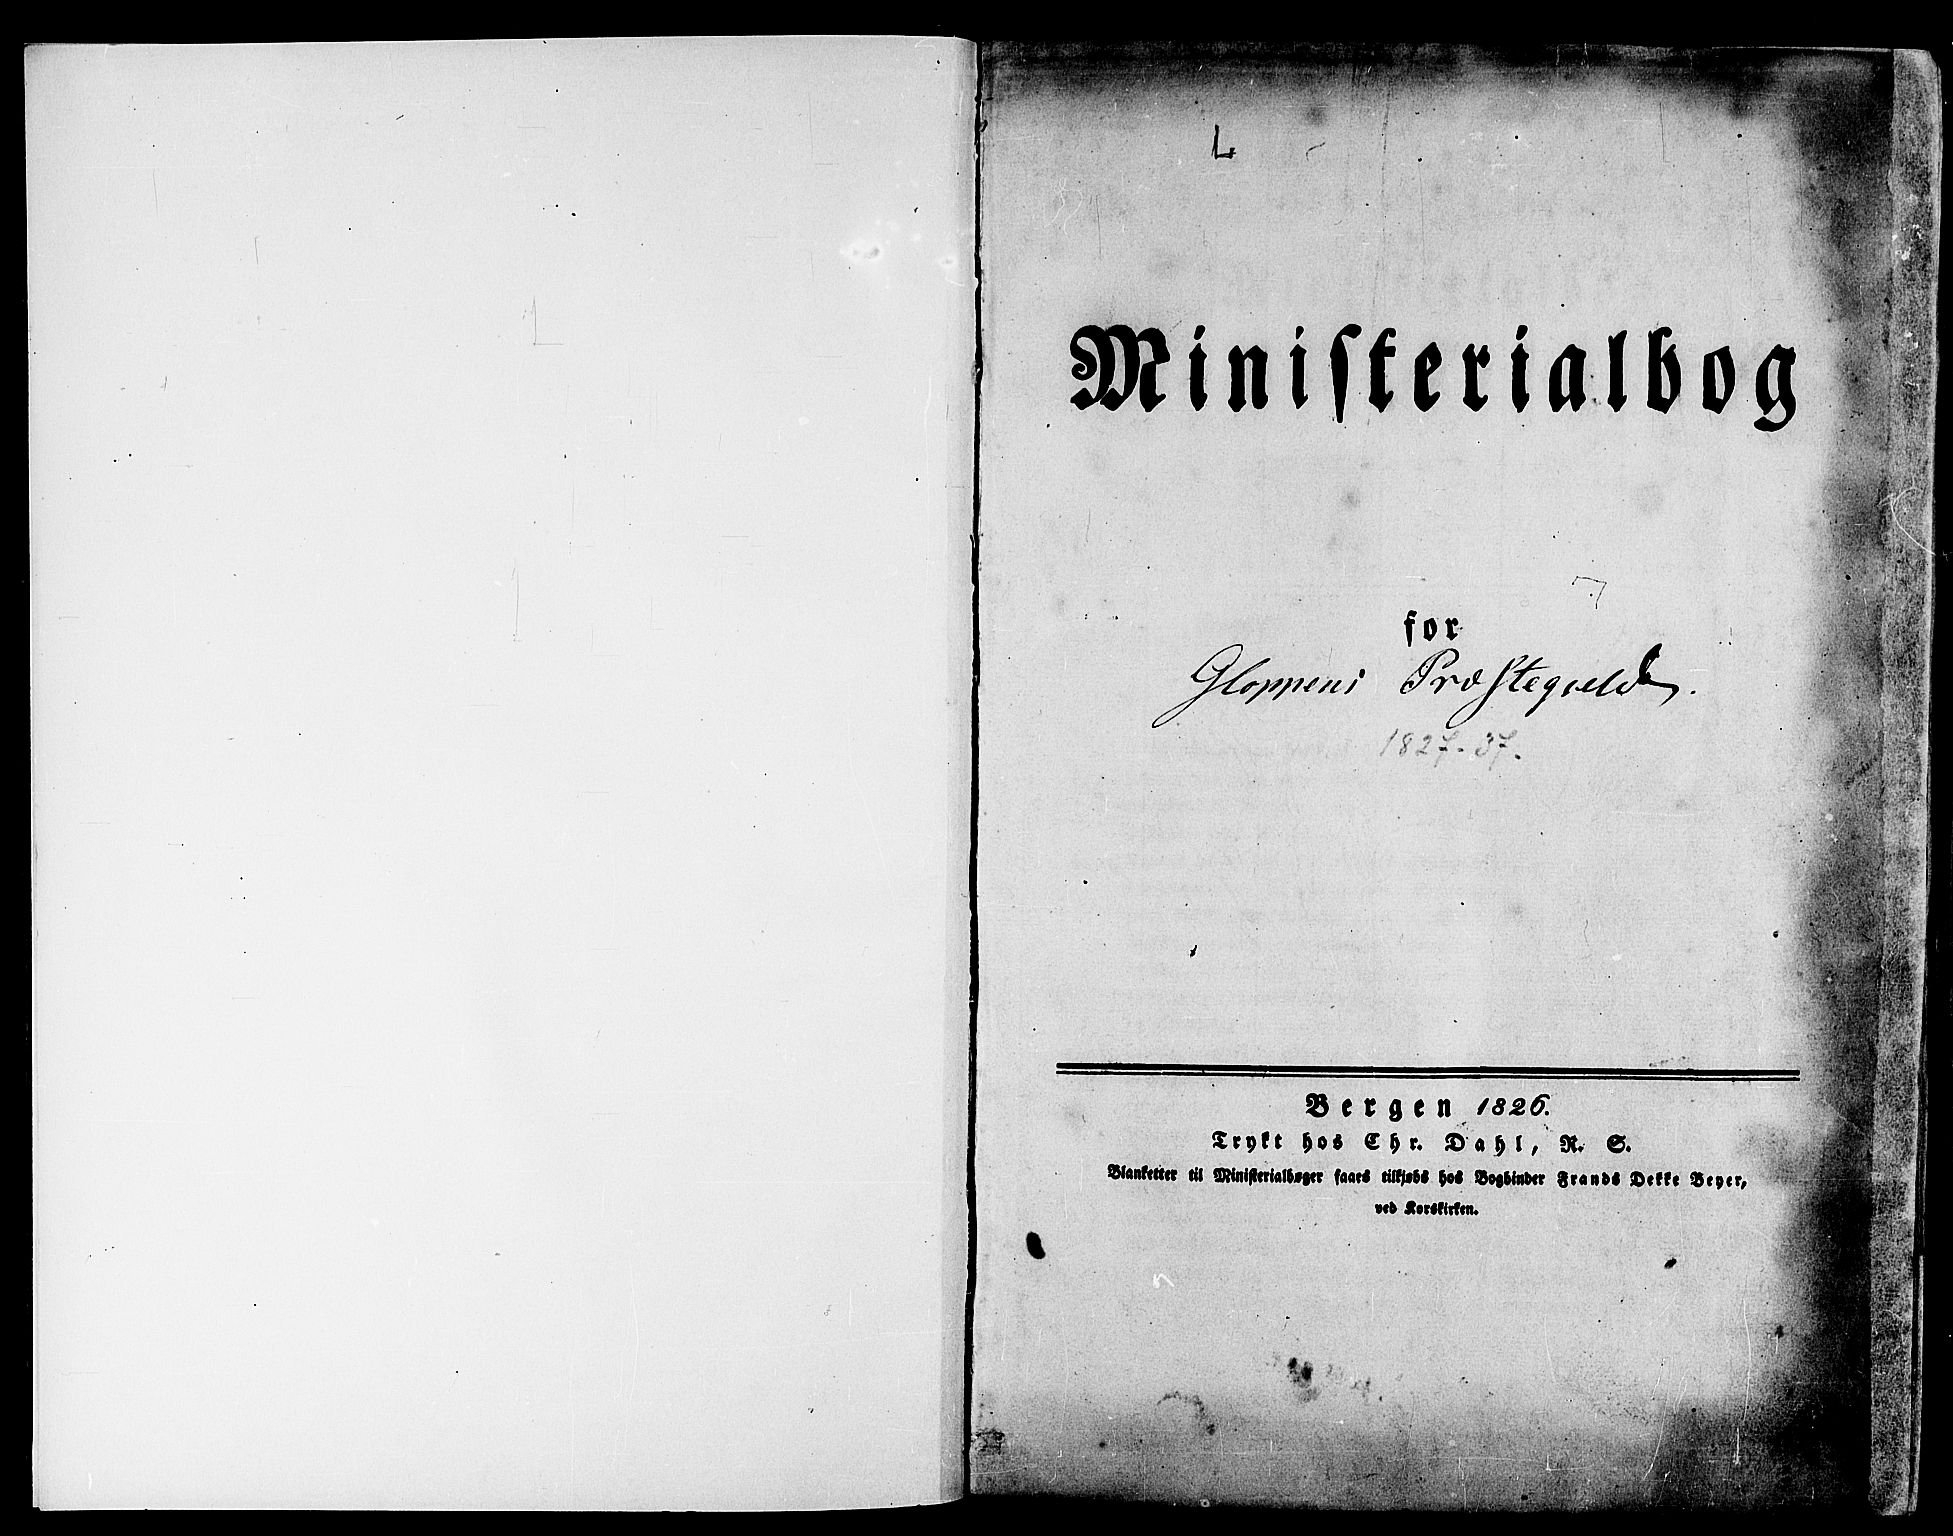 SAB, Gloppen Sokneprestembete, H/Haa/Haaa/L0007: Ministerialbok nr. A 7, 1827-1837